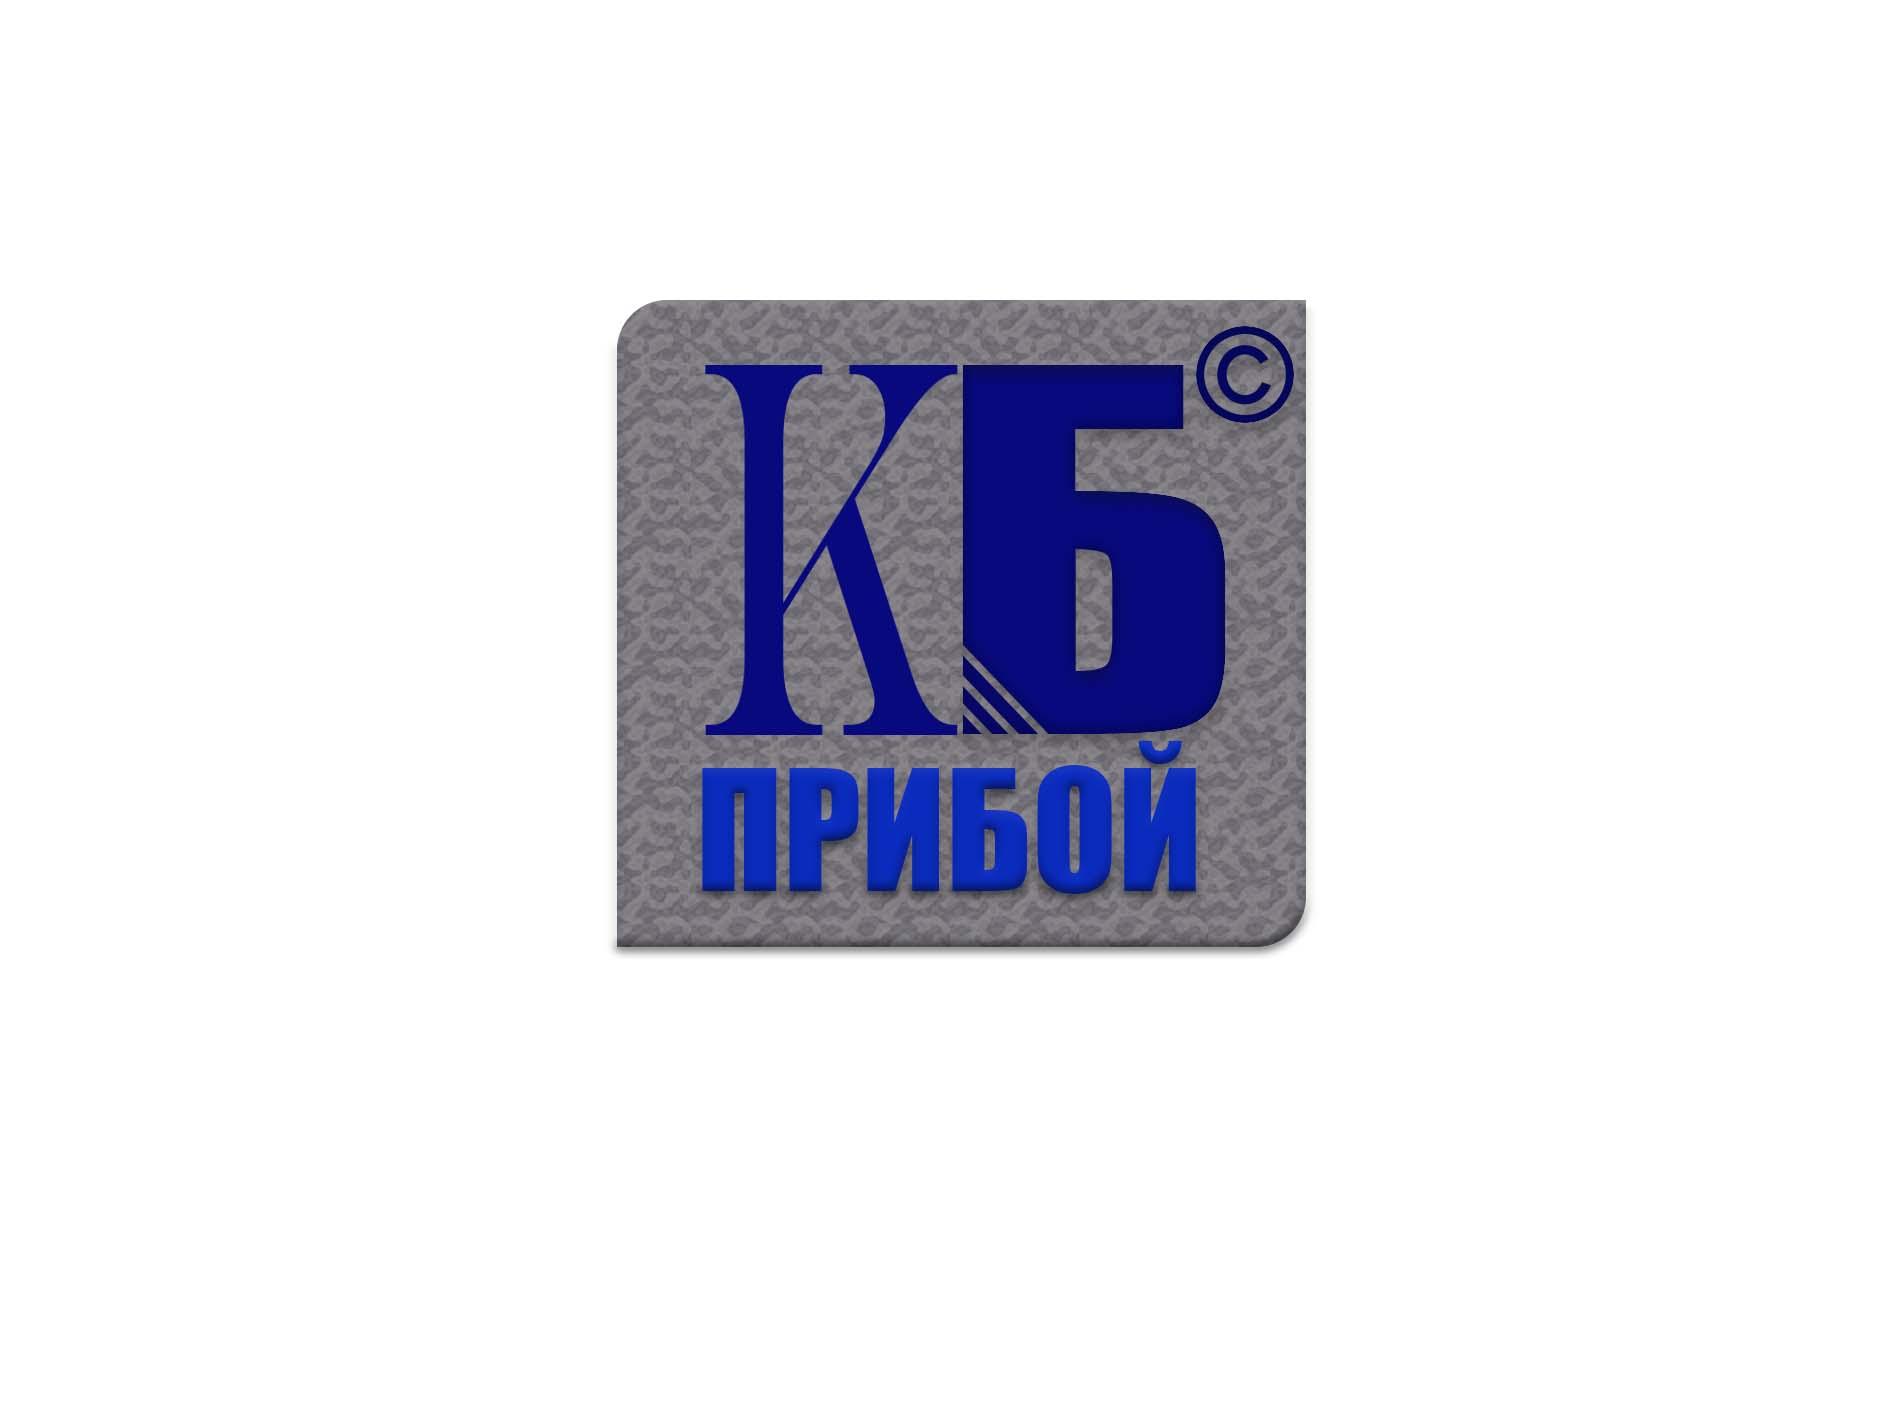 Разработка логотипа и фирменного стиля для КБ Прибой фото f_2895b274524a815b.jpg